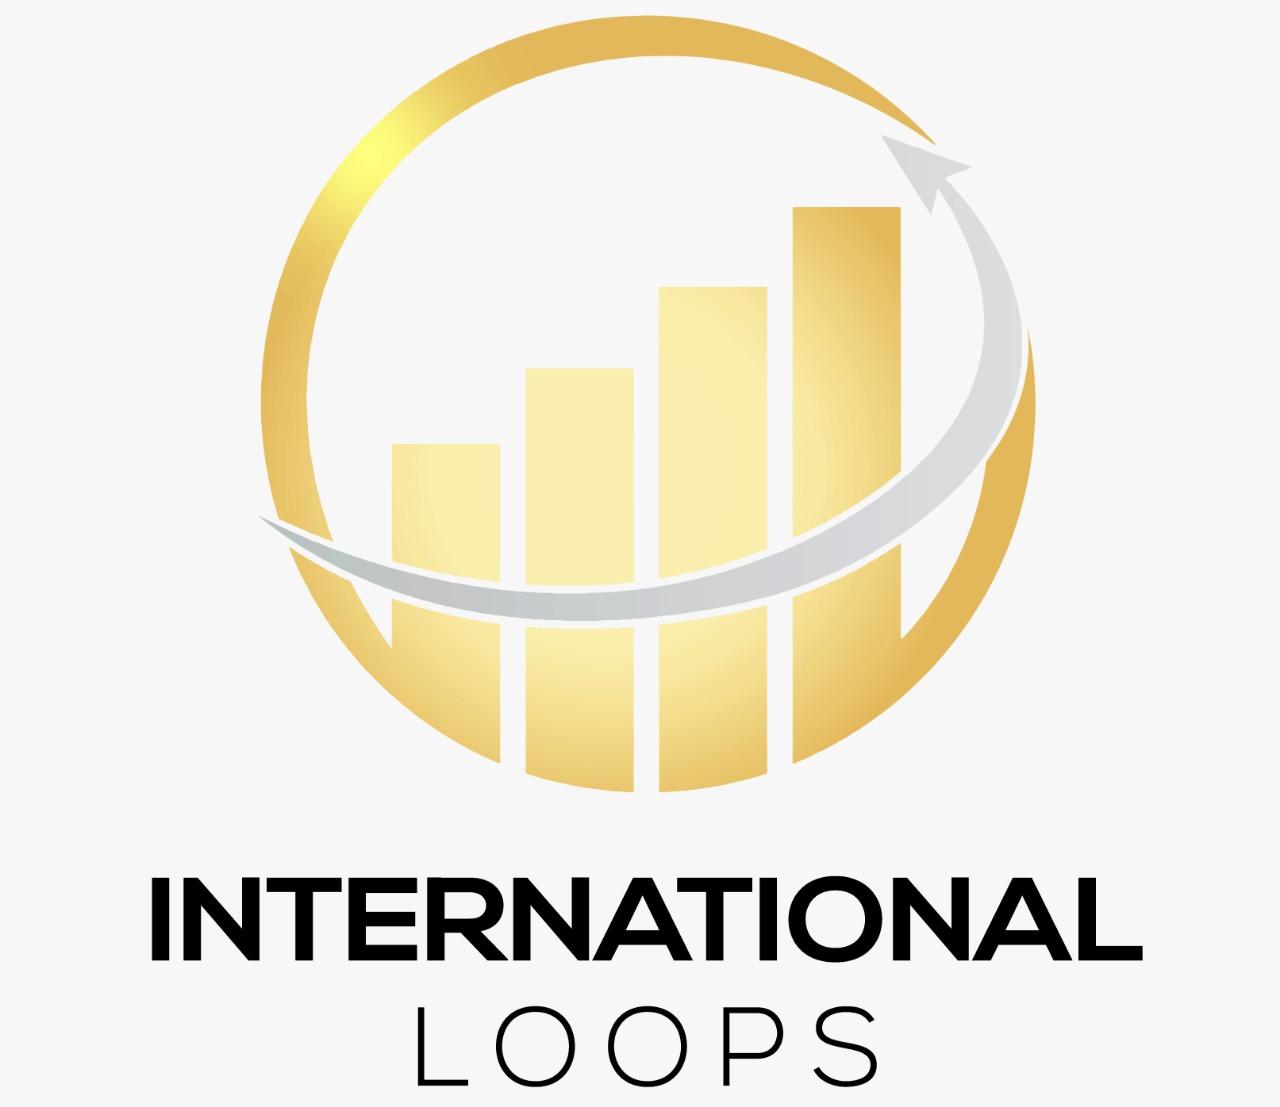 1_International_Loops.jpeg